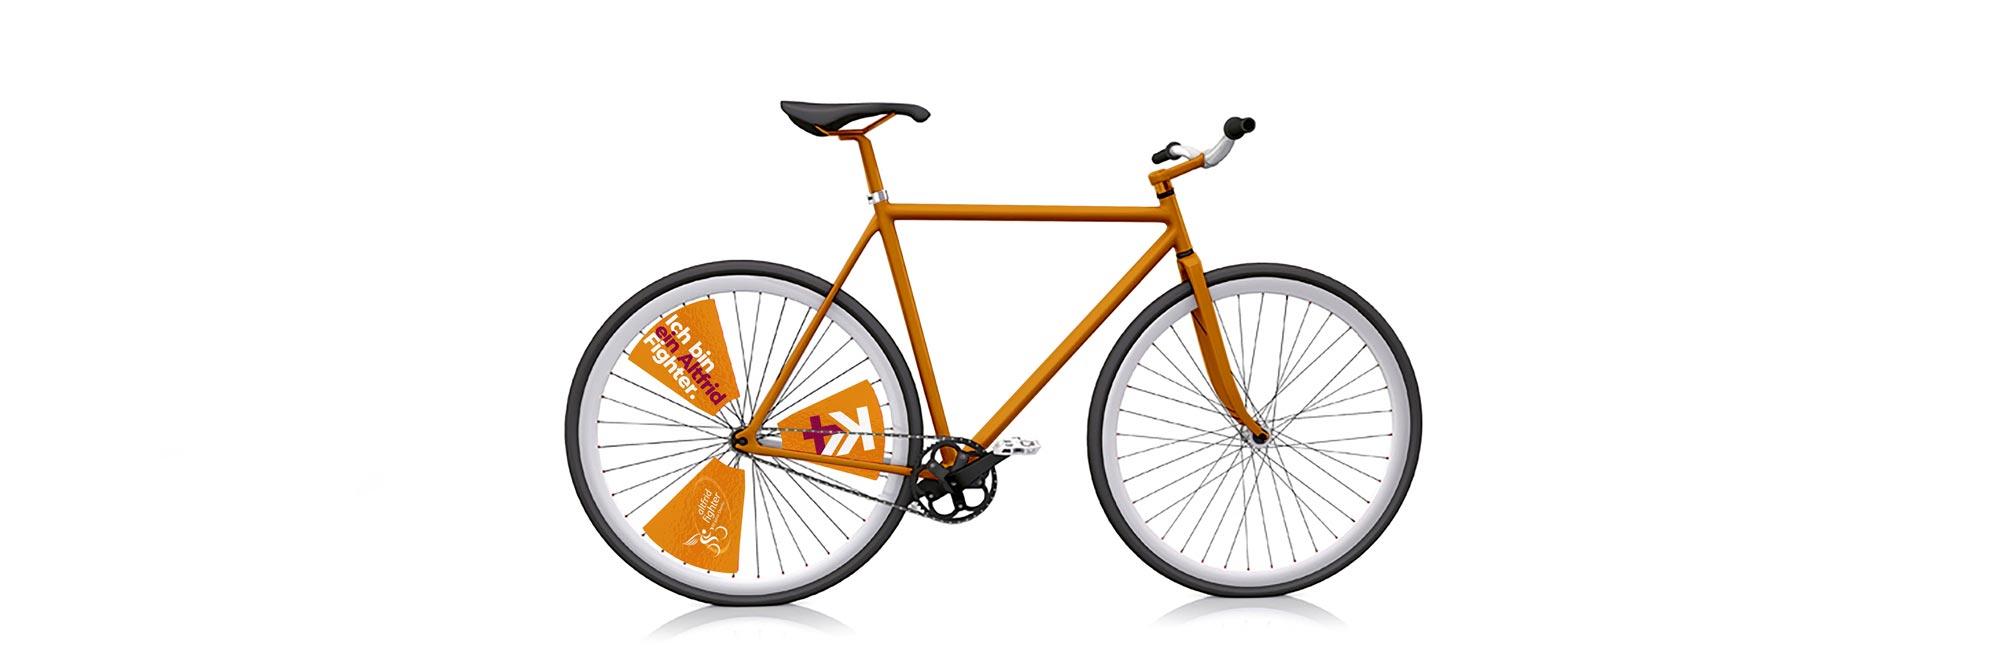 Rad am Ring Fahrradbeschriftung, Eventbranding, Corporate Design, Non-Profit